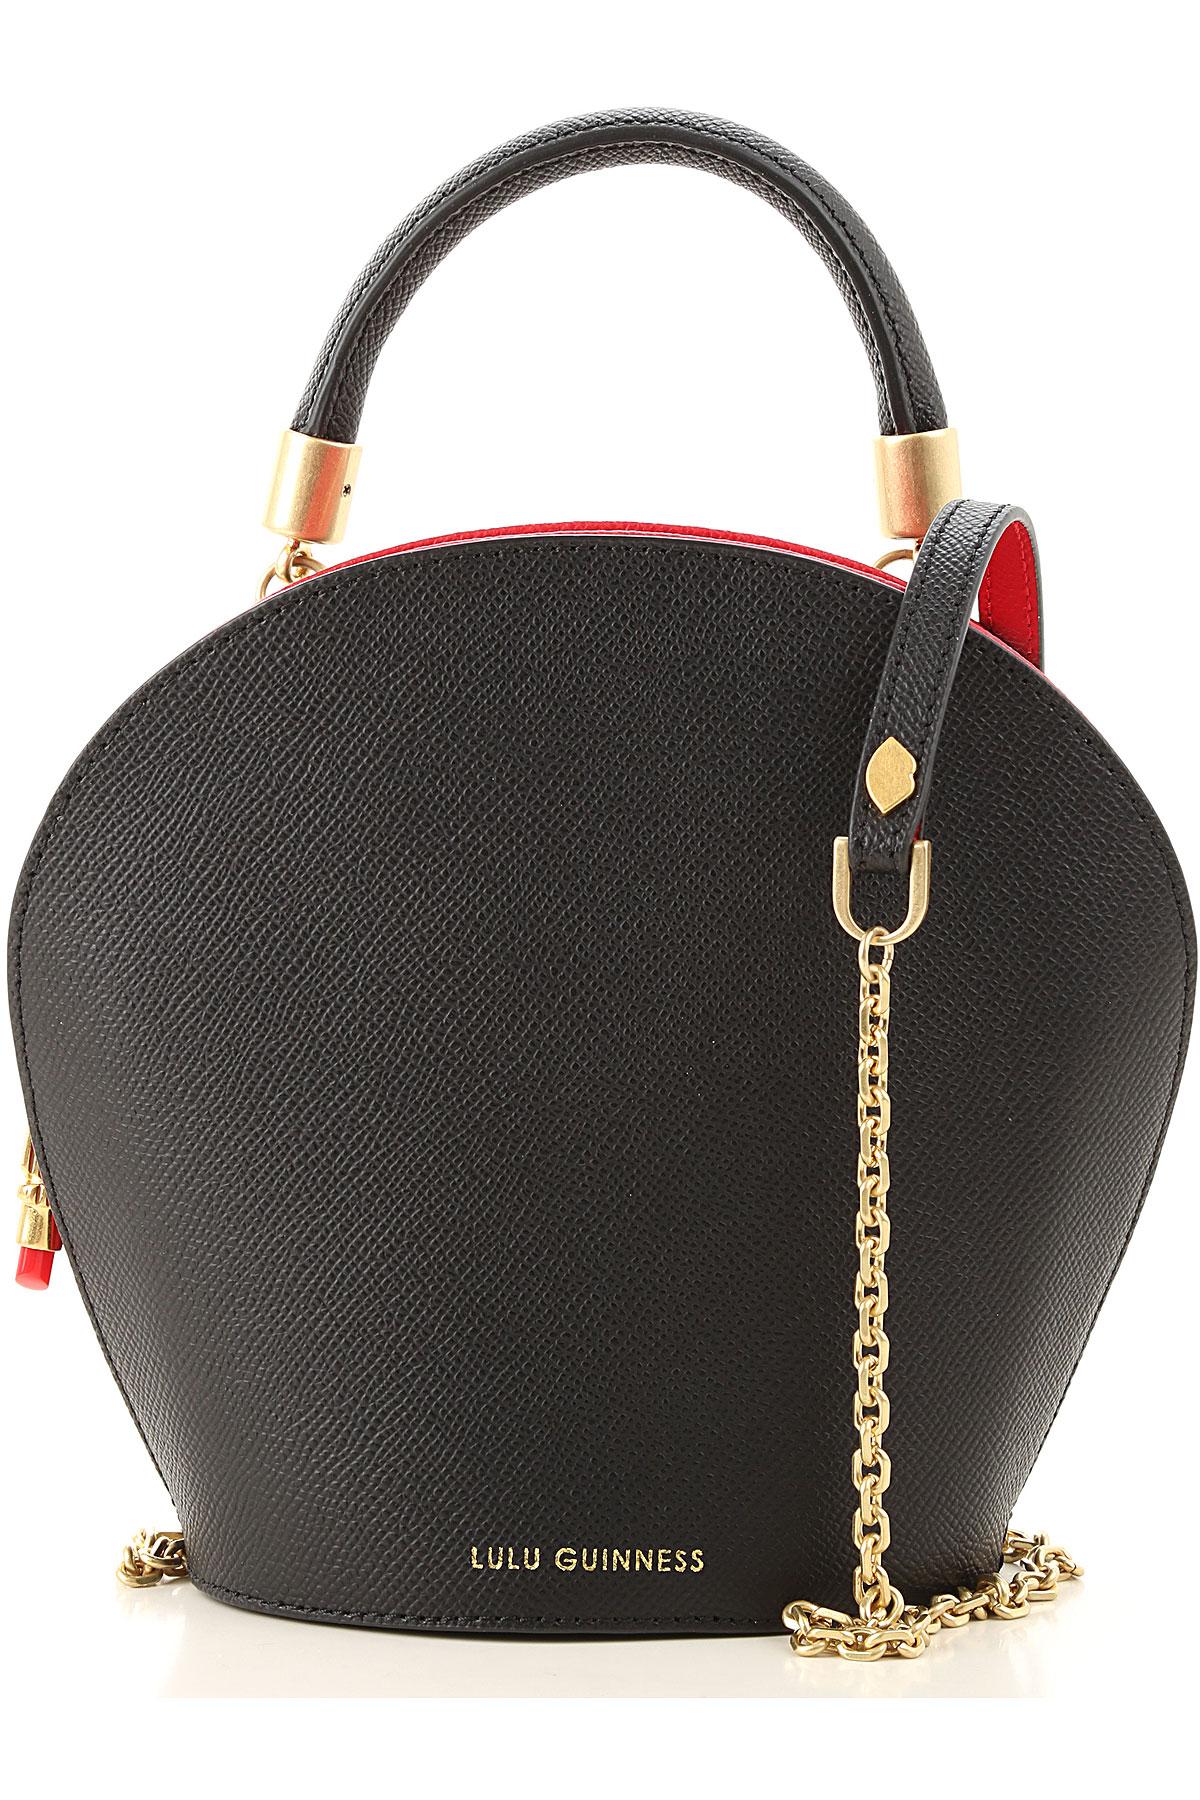 Lulu Guinness Top Handle Handbag On Sale, Black, Grain, 2019